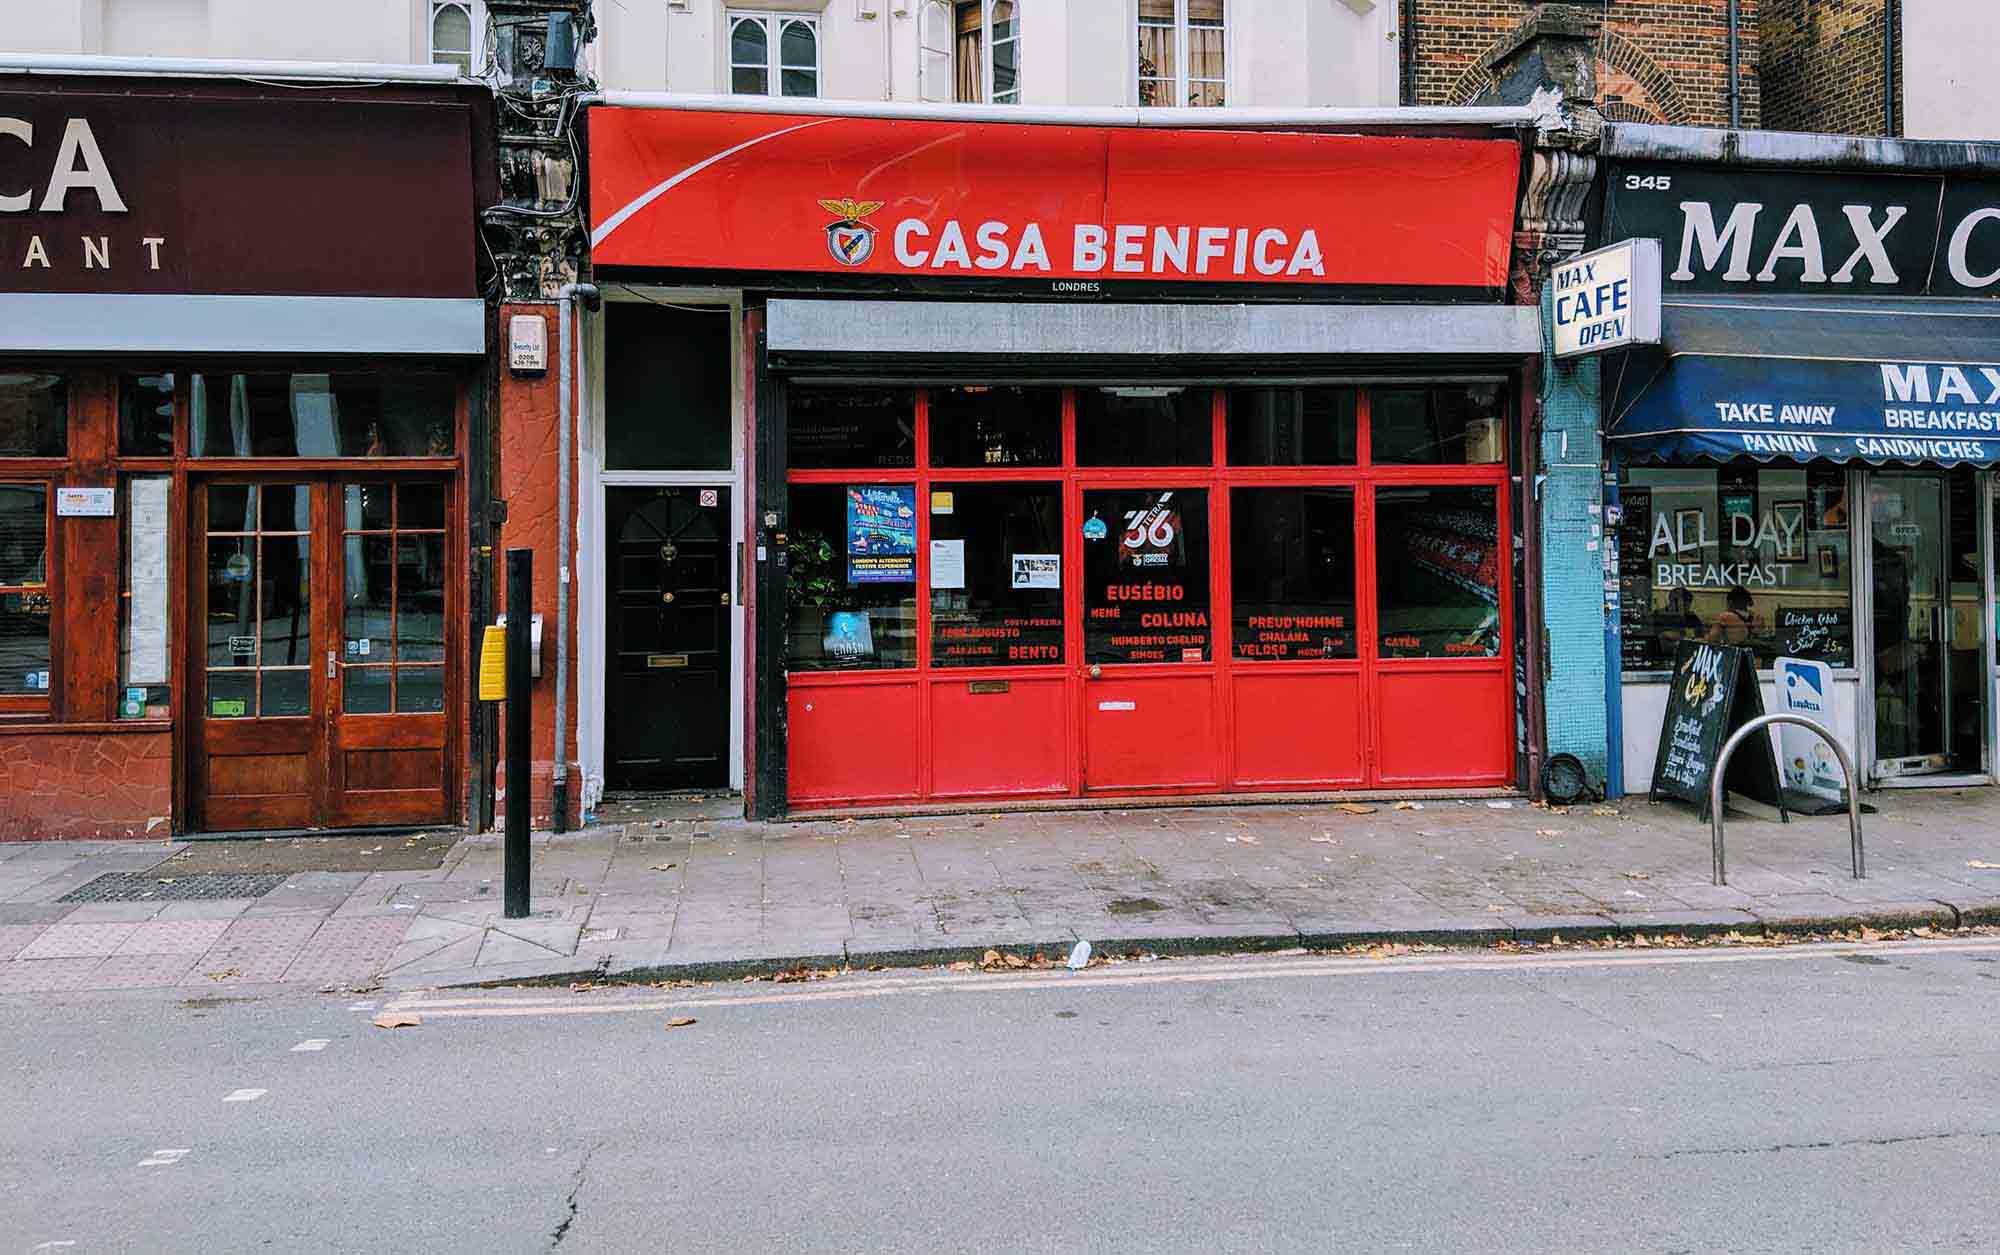 Casa Benfica on Wandsworth Road